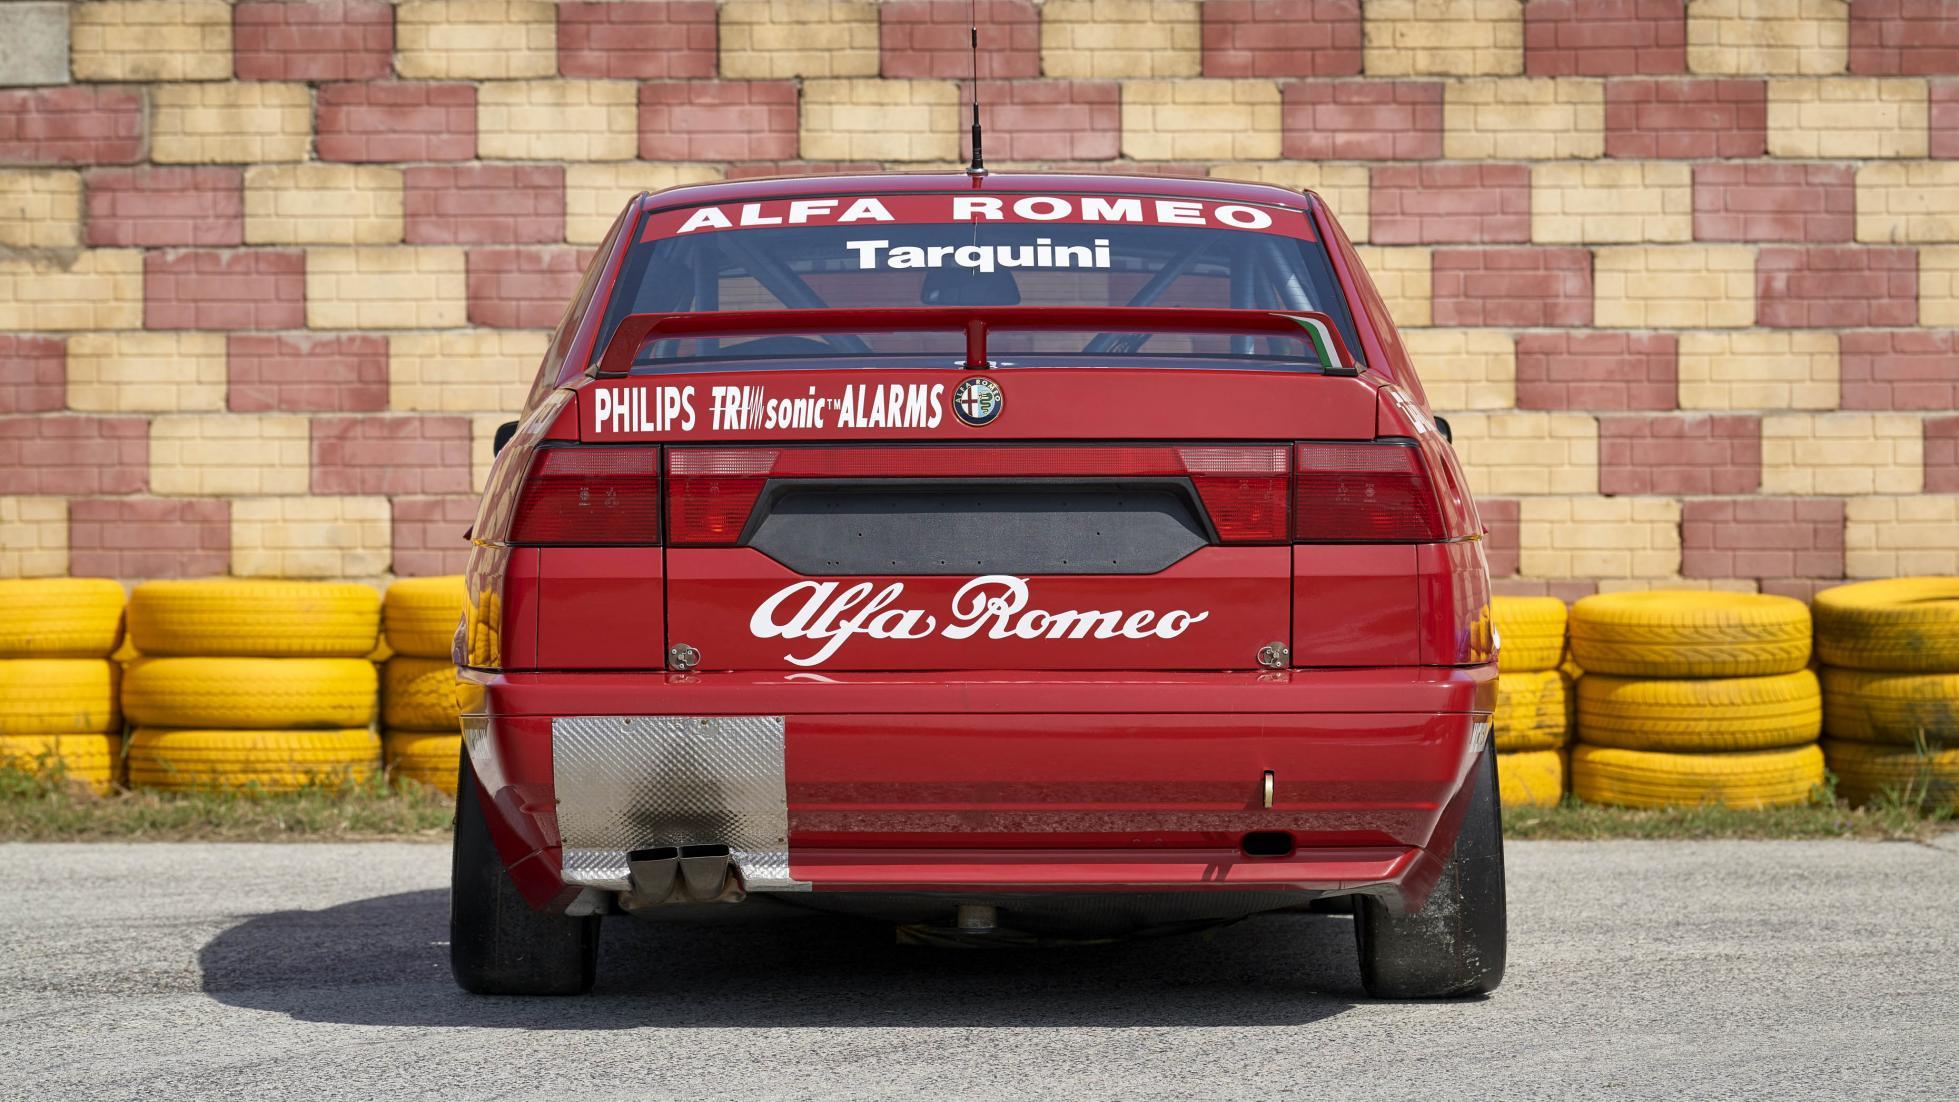 ALFA ROMEO 155 TS BTCC